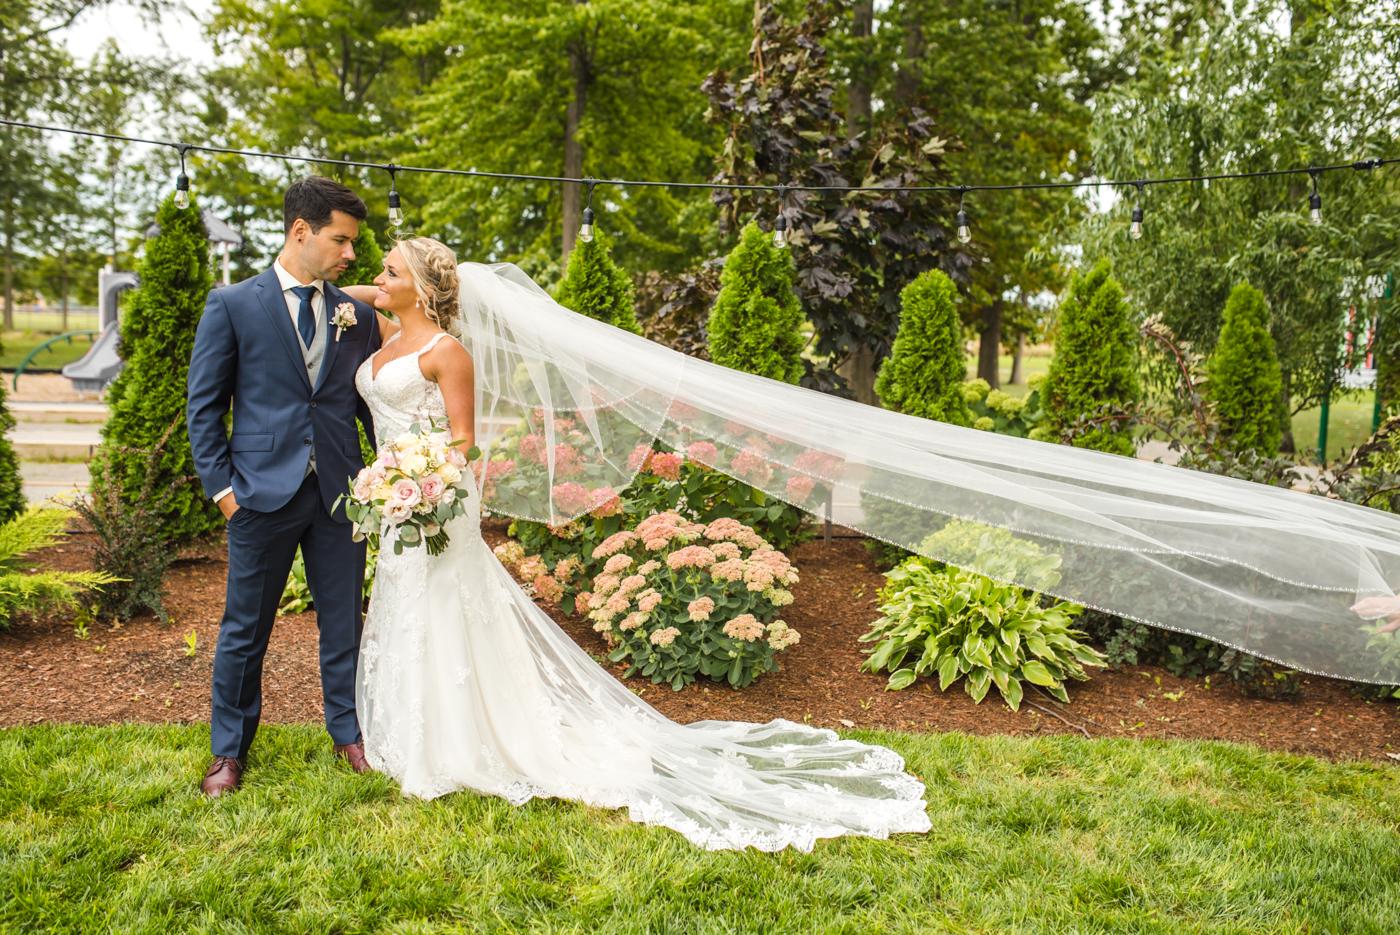 Eli & Michelle Wedding Hamilton St Catharines Niagara Ontario Club Roma Outdoor September Summer Aidan Hennebry of Hush Hush Photography & Film-23.jpg